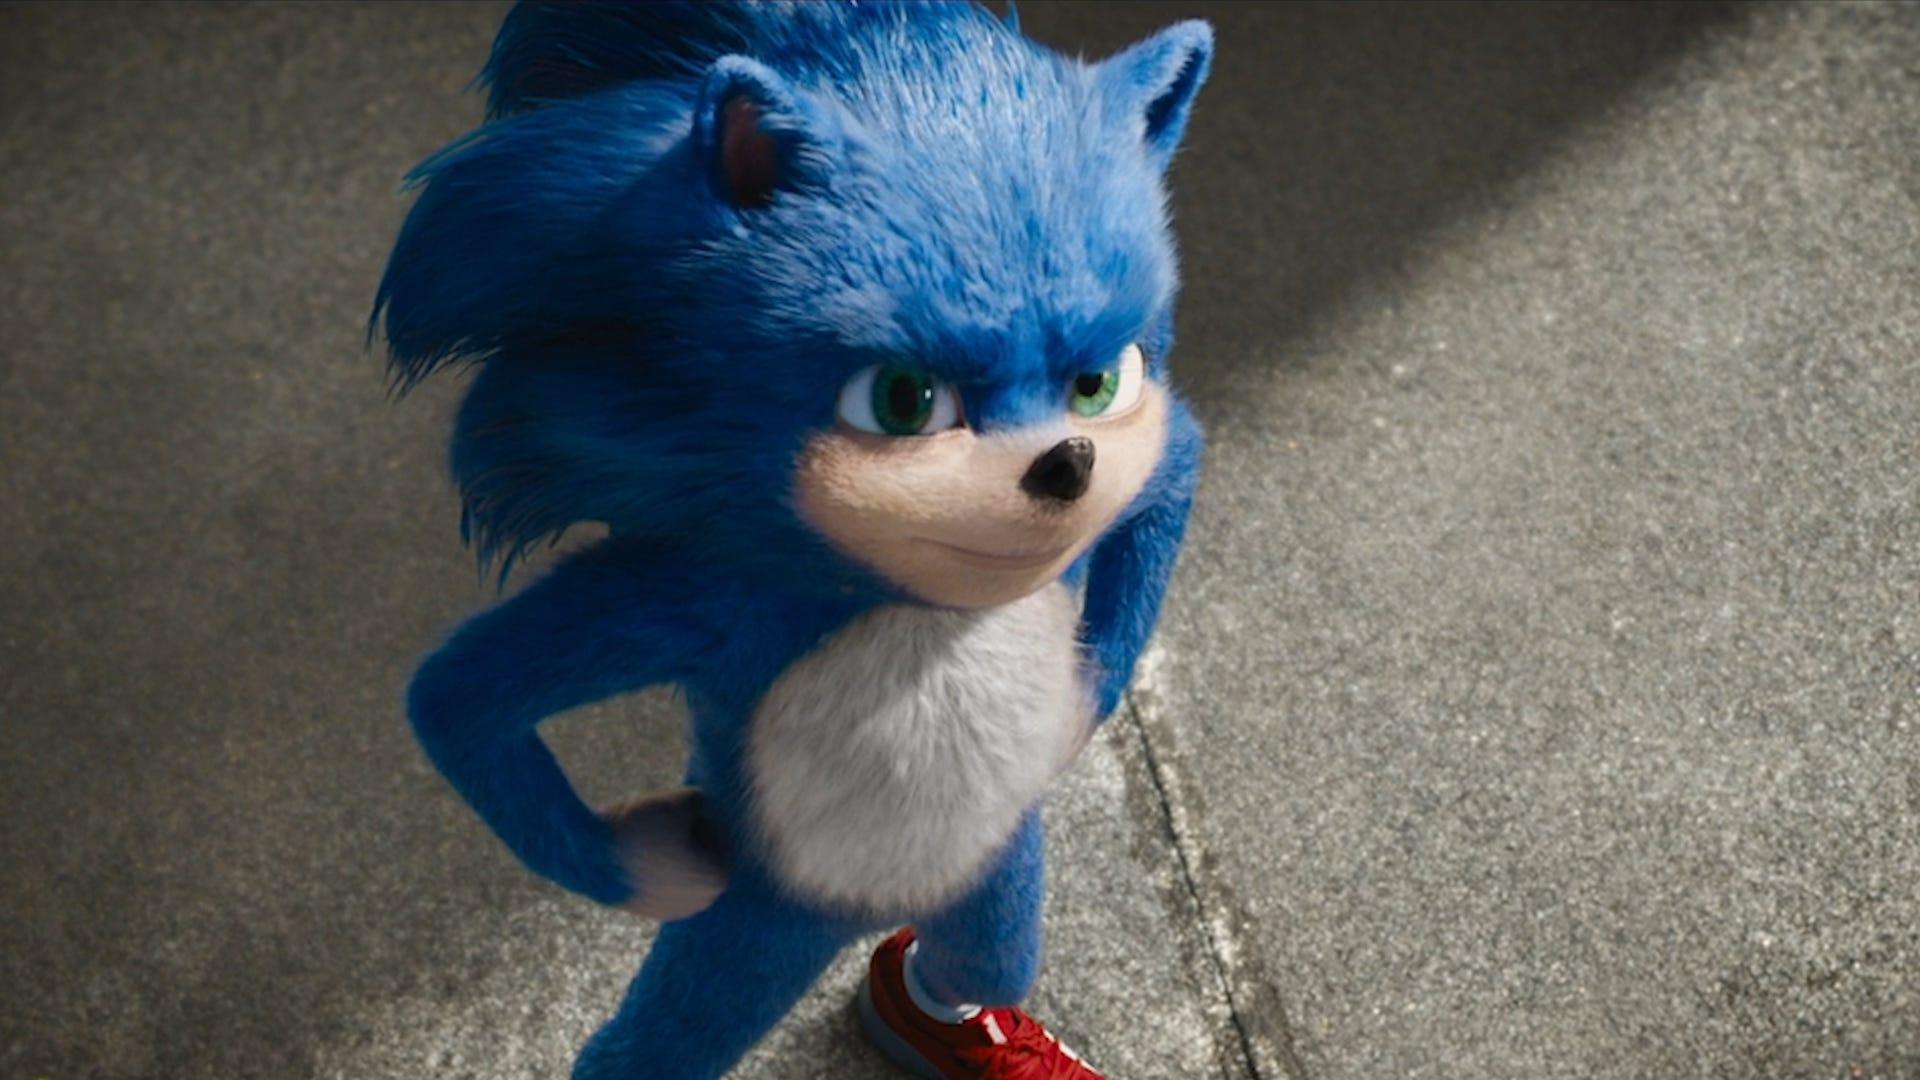 Sonic the Hedgehog director promises redesign after fan backlash 1920x1080